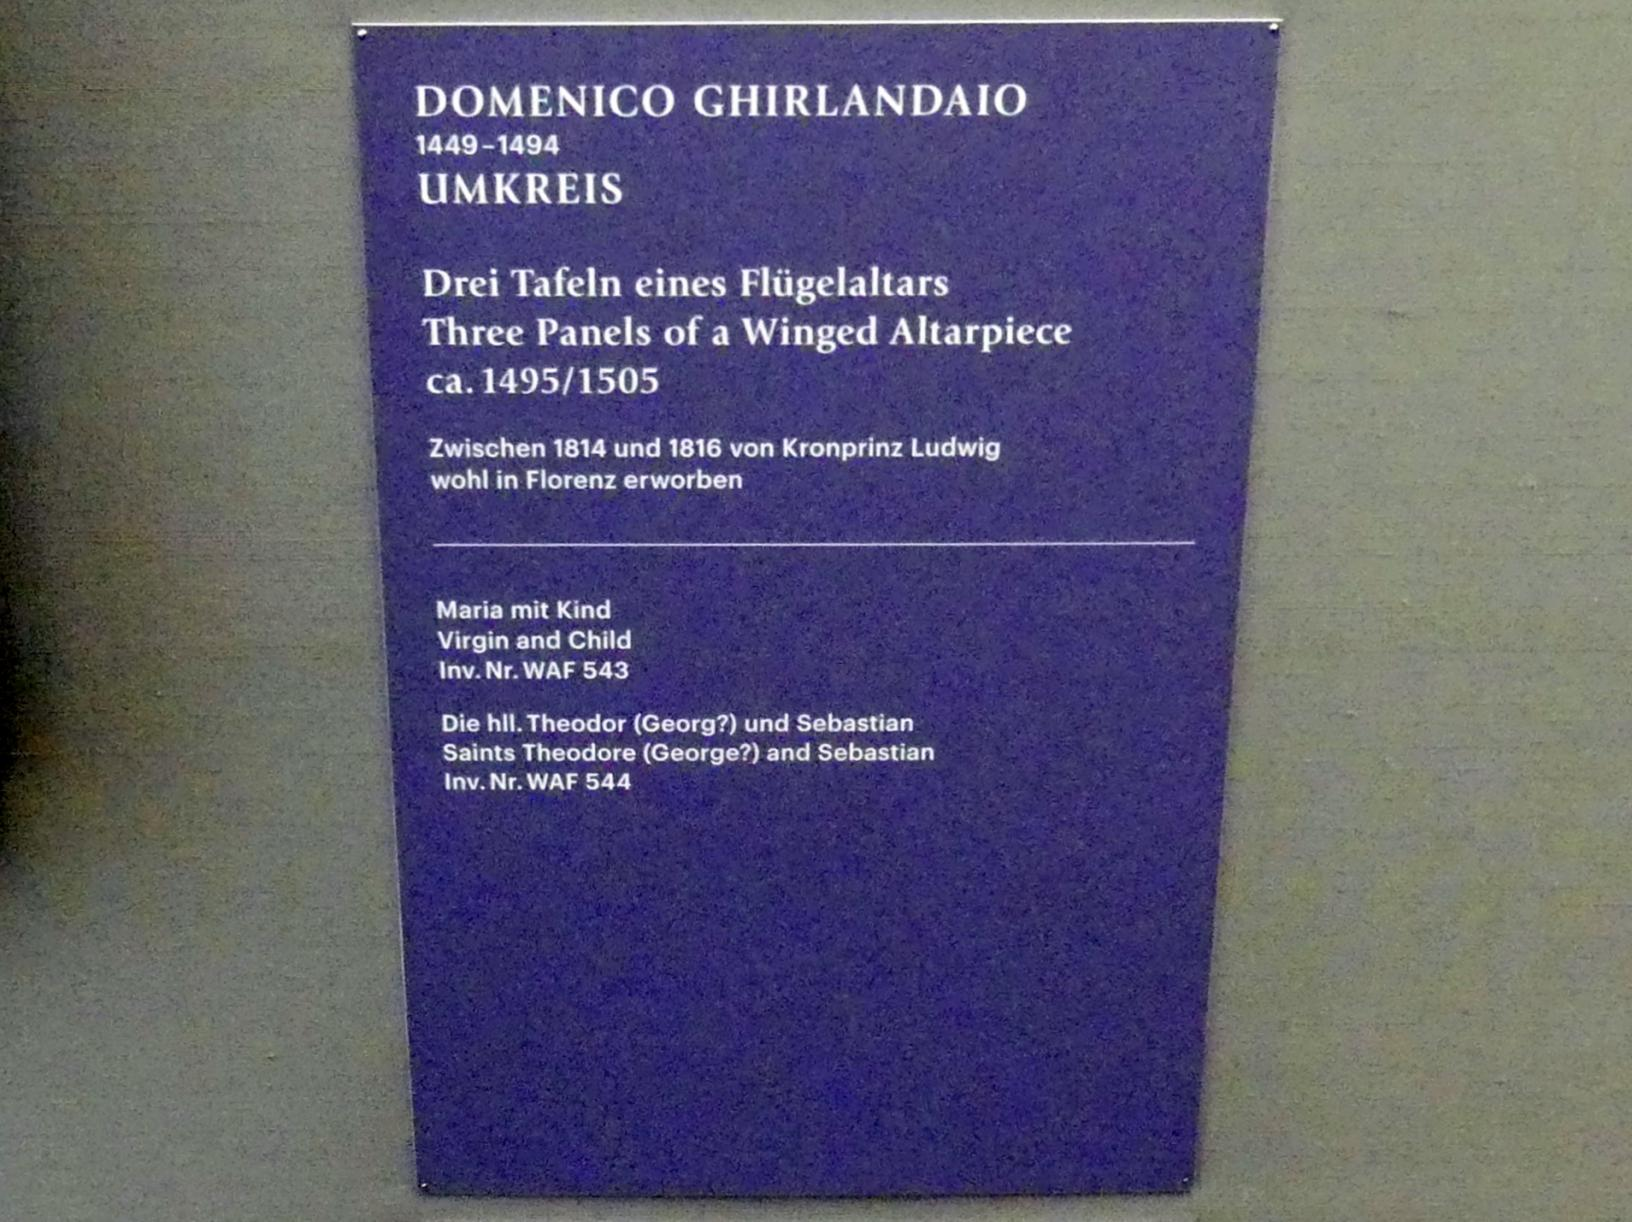 Domenico Ghirlandaio (Umkreis): Drei Tafeln eines Flügelaltars, um 1495 - 1505, Bild 2/3